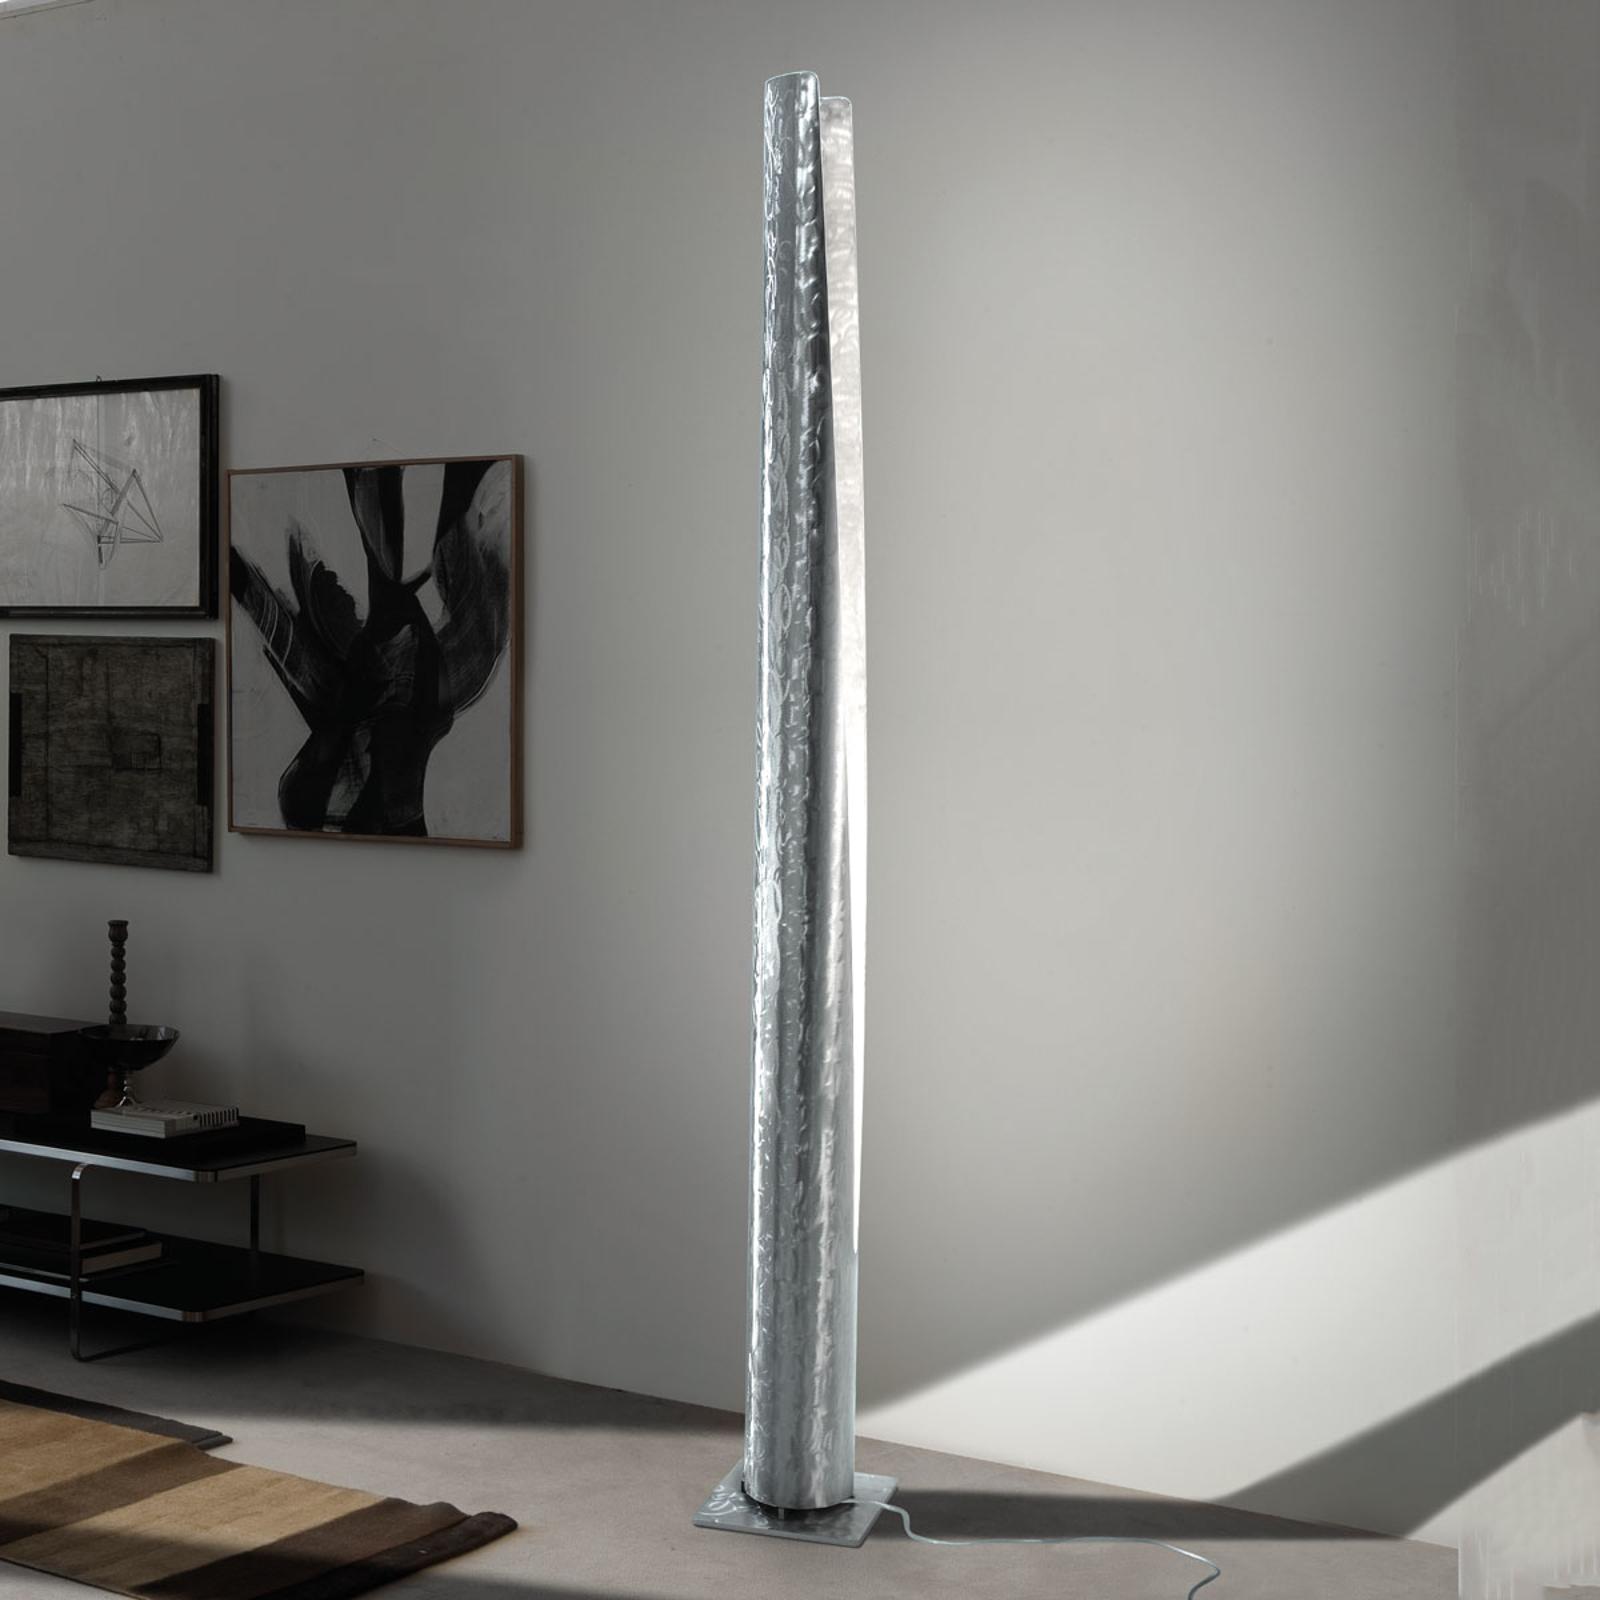 Eksklusiv standerlampe Cannula i børstet stål